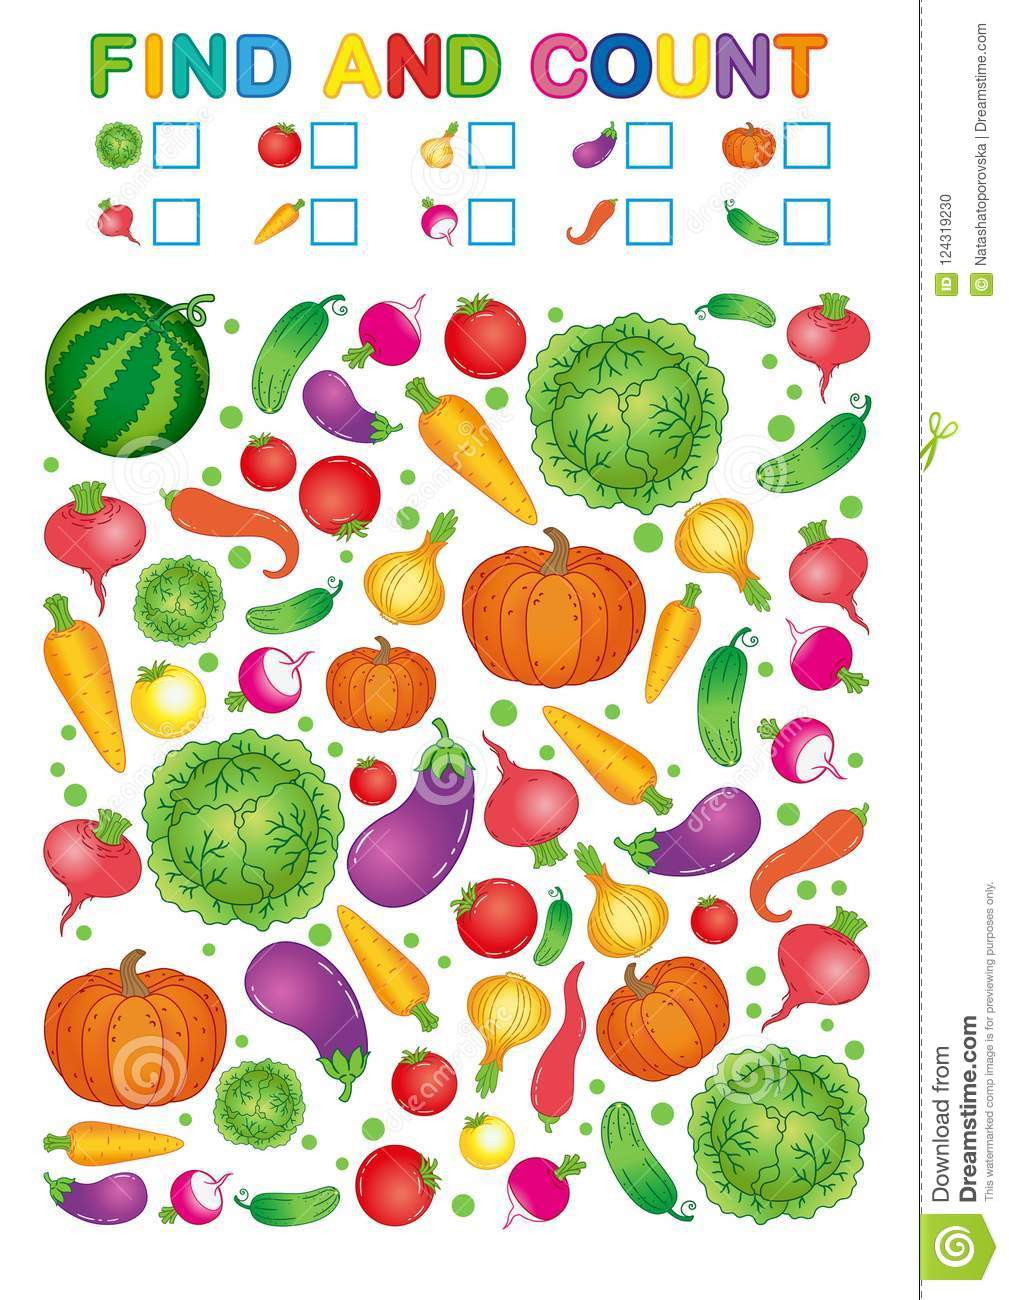 Preschool Fruits and Vegetables Worksheets Find and Count Printable Worksheet for Kindergarten and